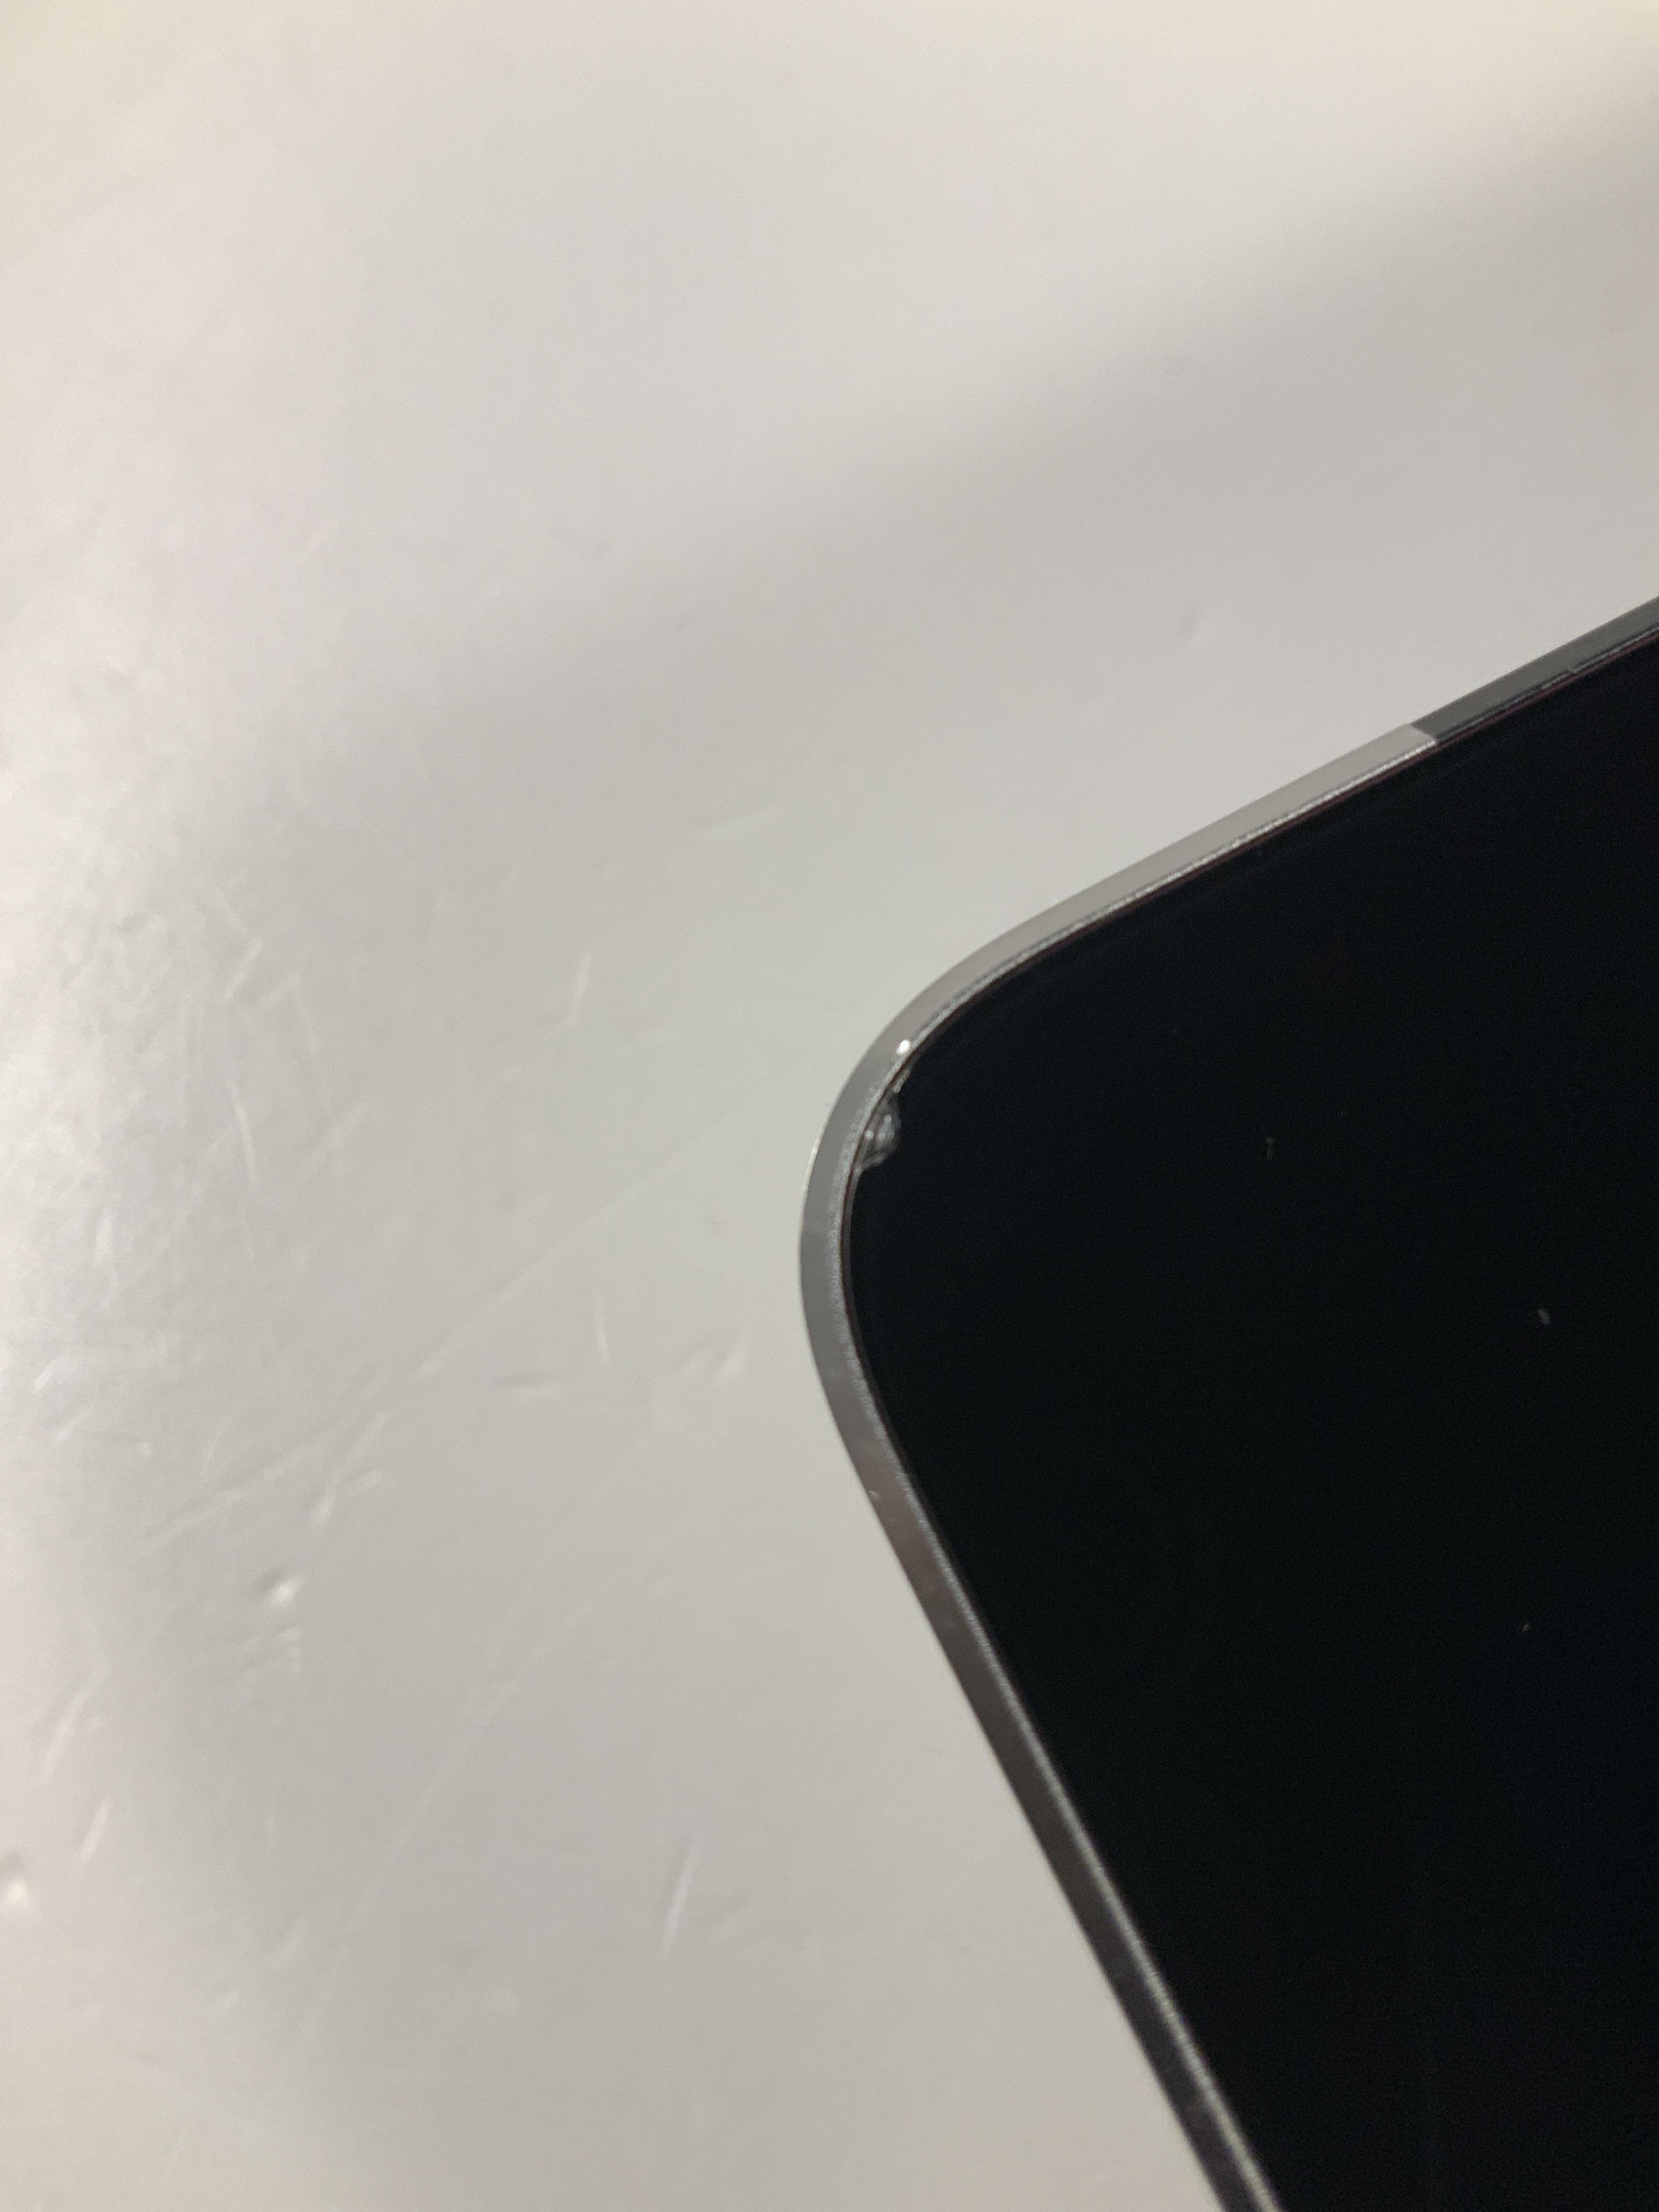 iPad Air 2 Wi-Fi + Cellular 32GB, 32GB, Space Gray, Kuva 2